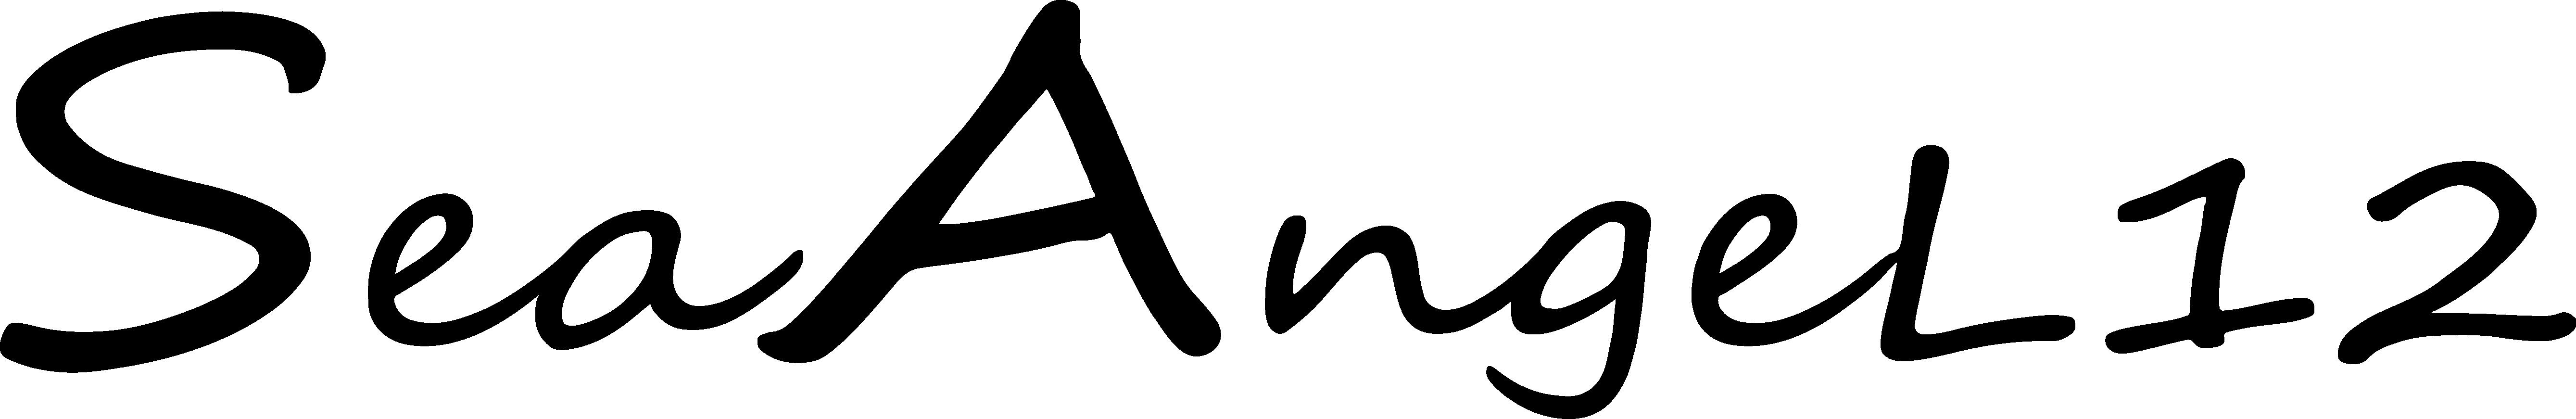 SEAANGEL12's Signature